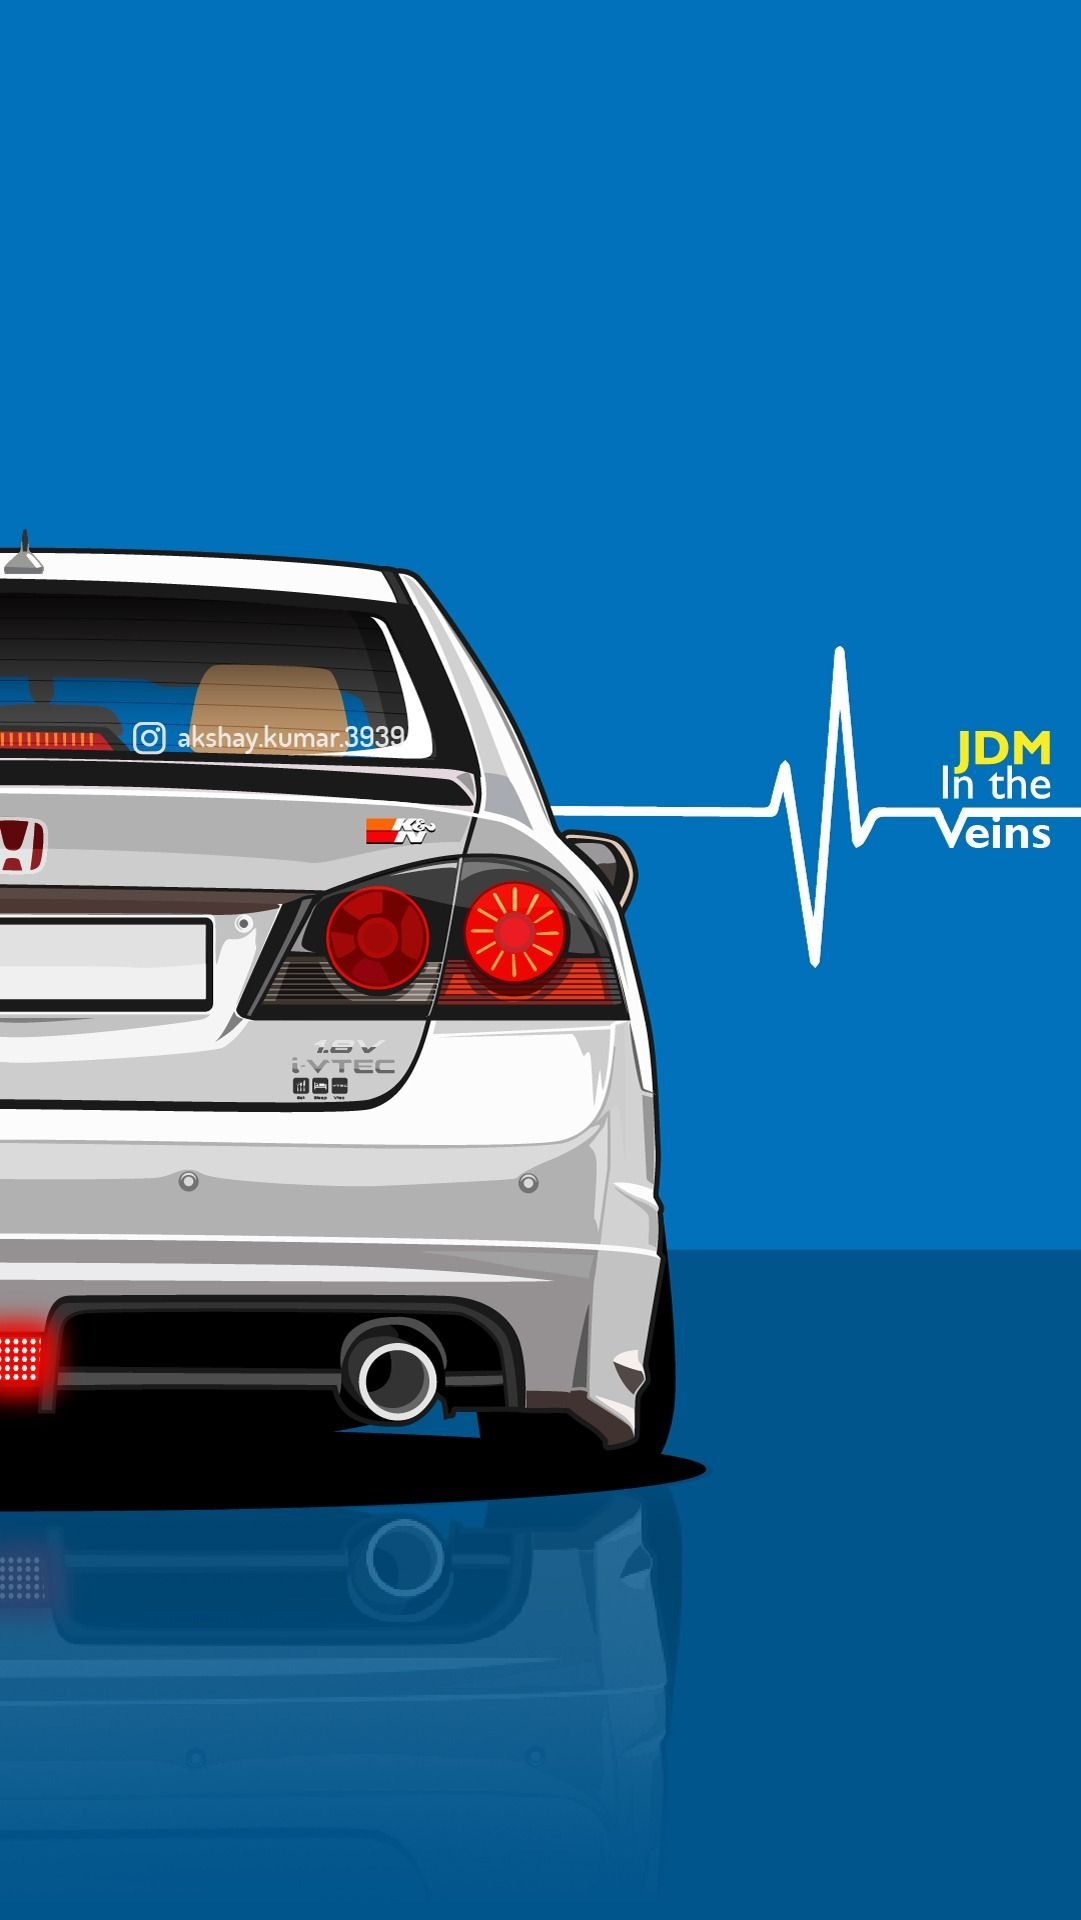 Honda Civic Fd2 Wallpaper Jdm Cars Stancenation Lowered Cars